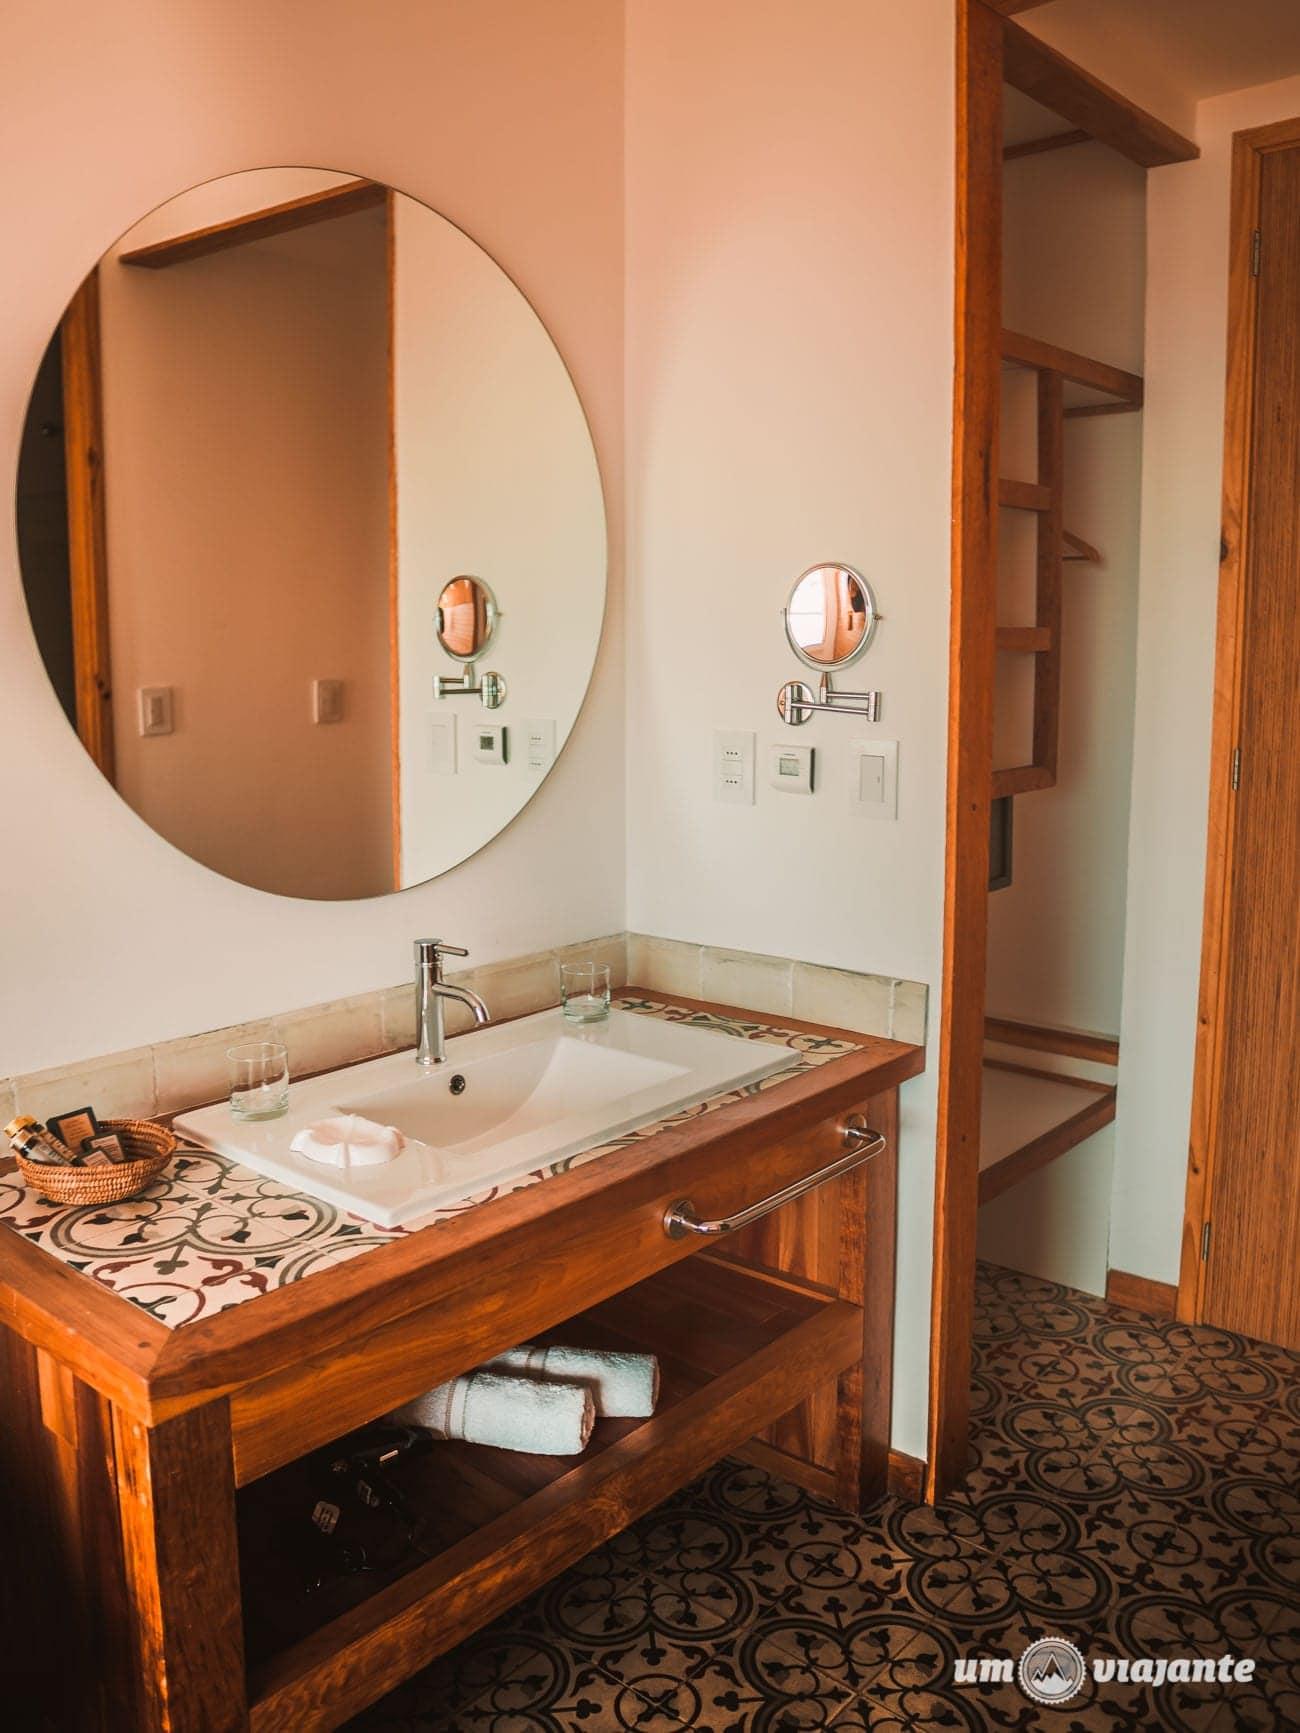 Banheiro do Simple Patagonia, Hotel em Puerto Natales - Chile